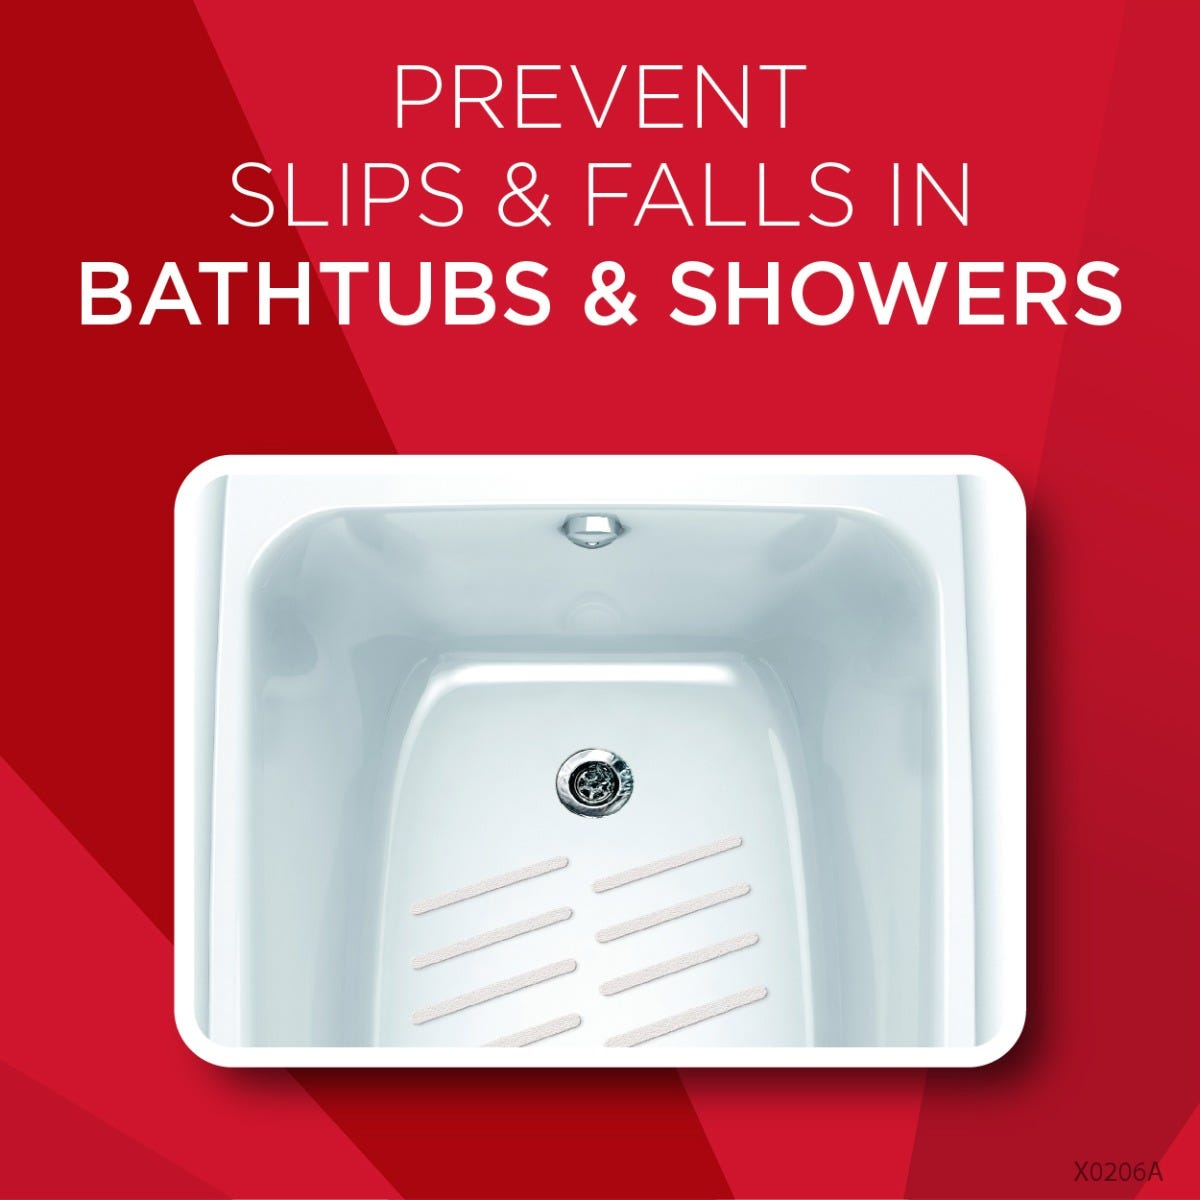 https://googone.com/media/catalog/product/p/r/prevent_bathtub_falls.jpg